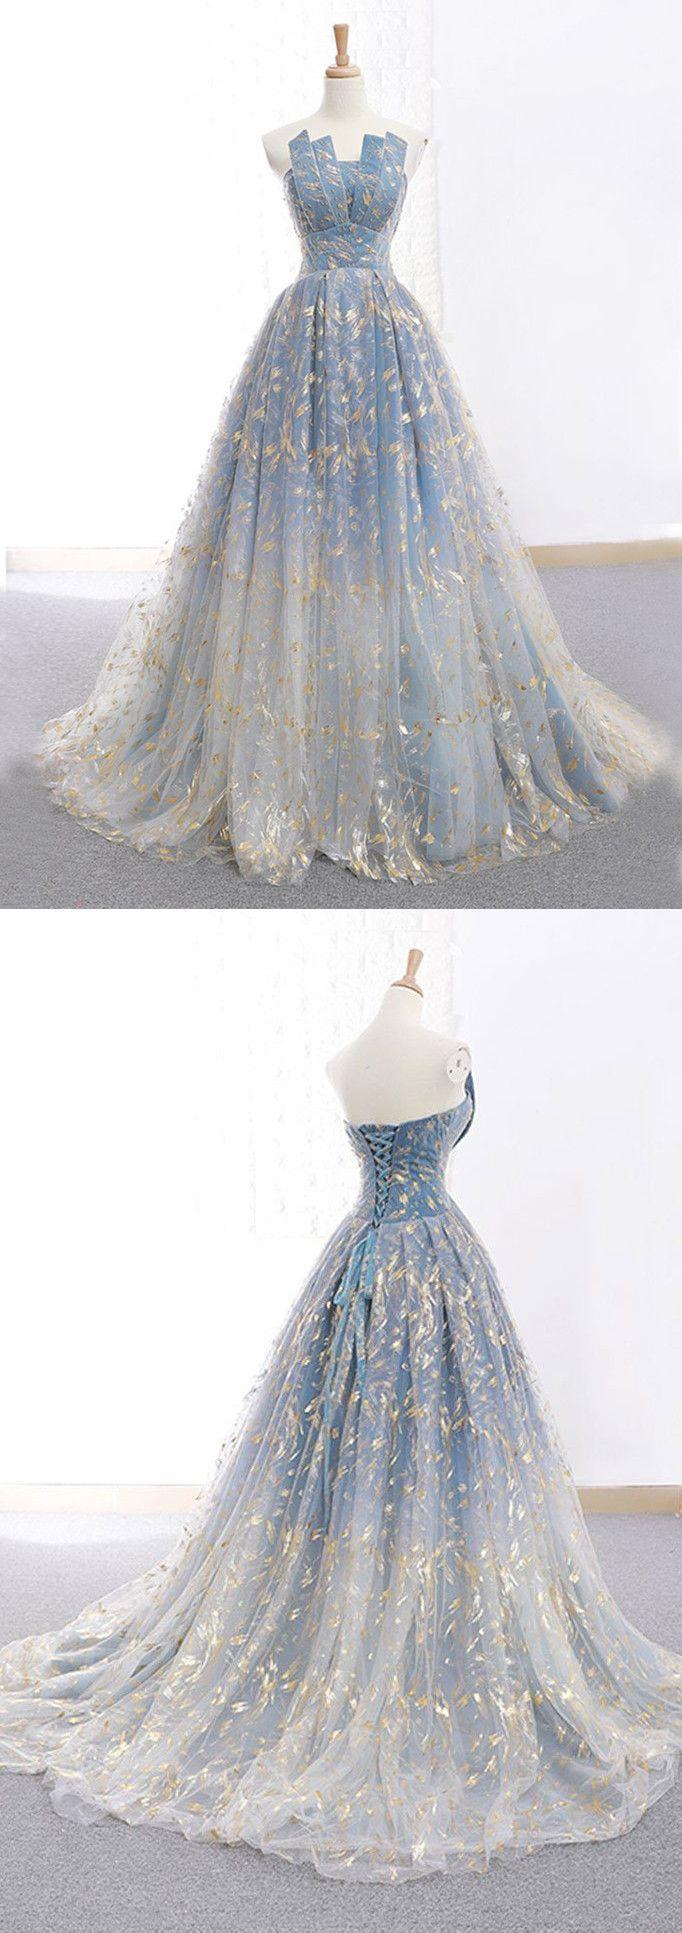 chic aline strapless lace prom dresses unique long prom dress